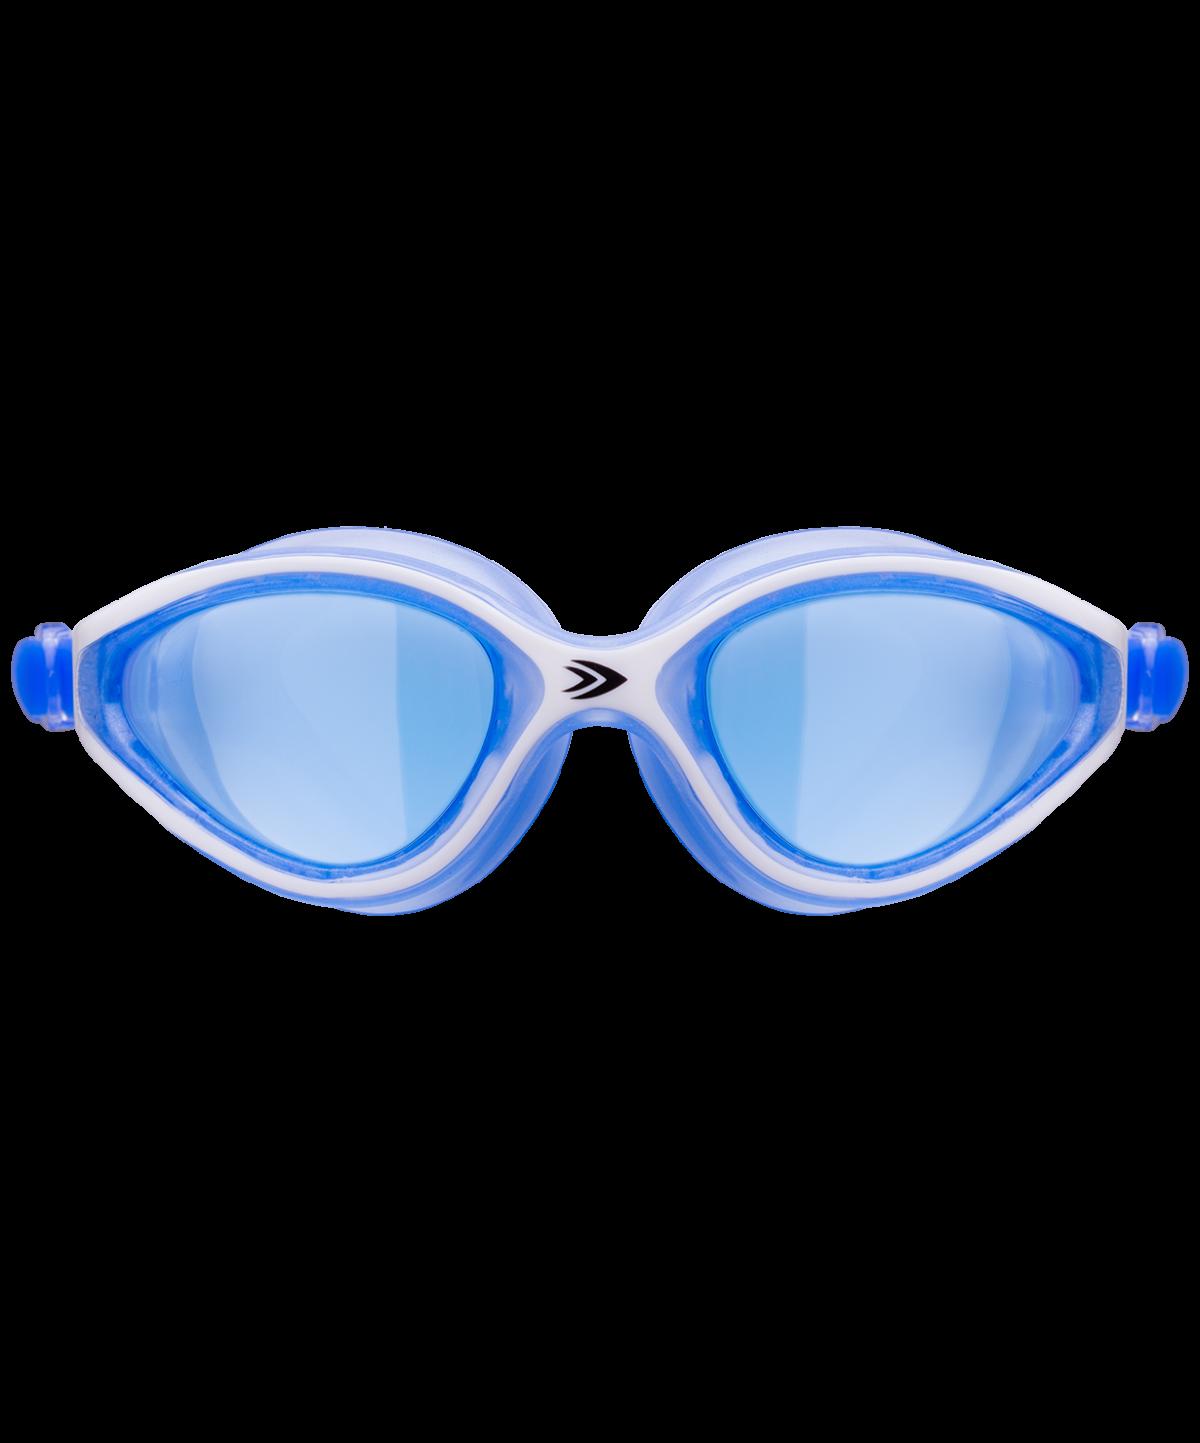 LONGSAIL Serena Очки для плавания  L011002: синий/белый - 2